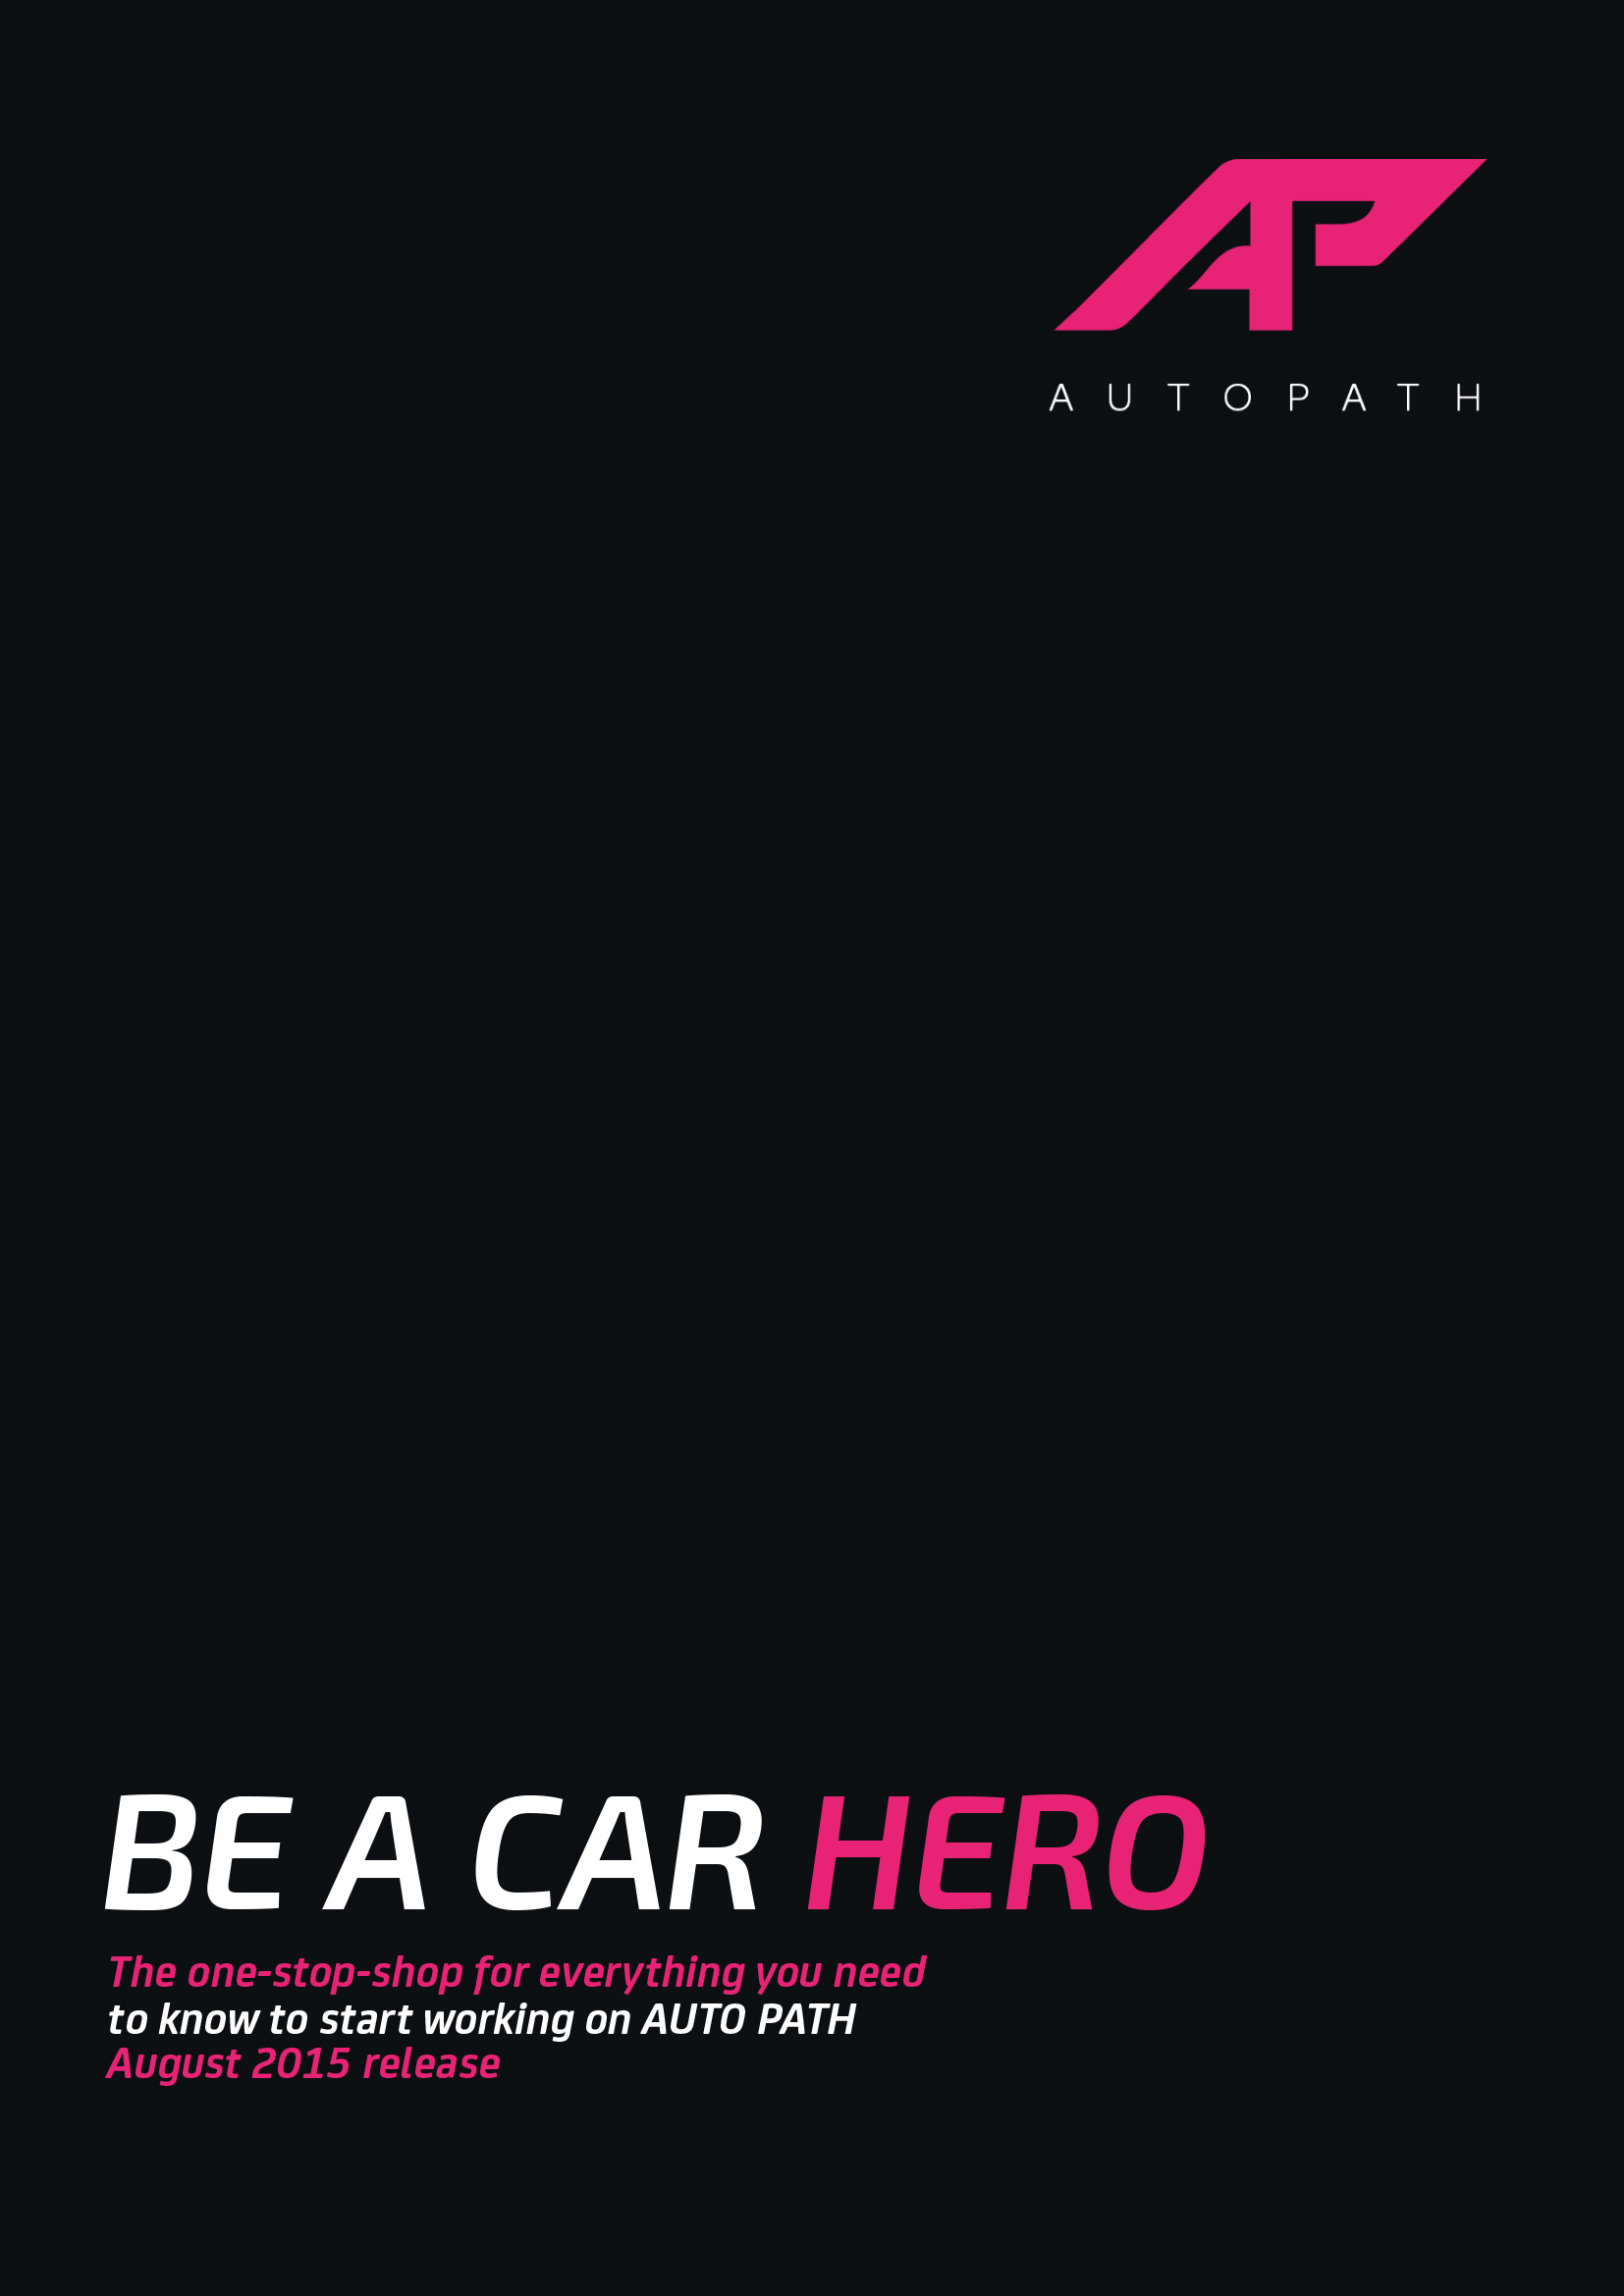 autopath_1